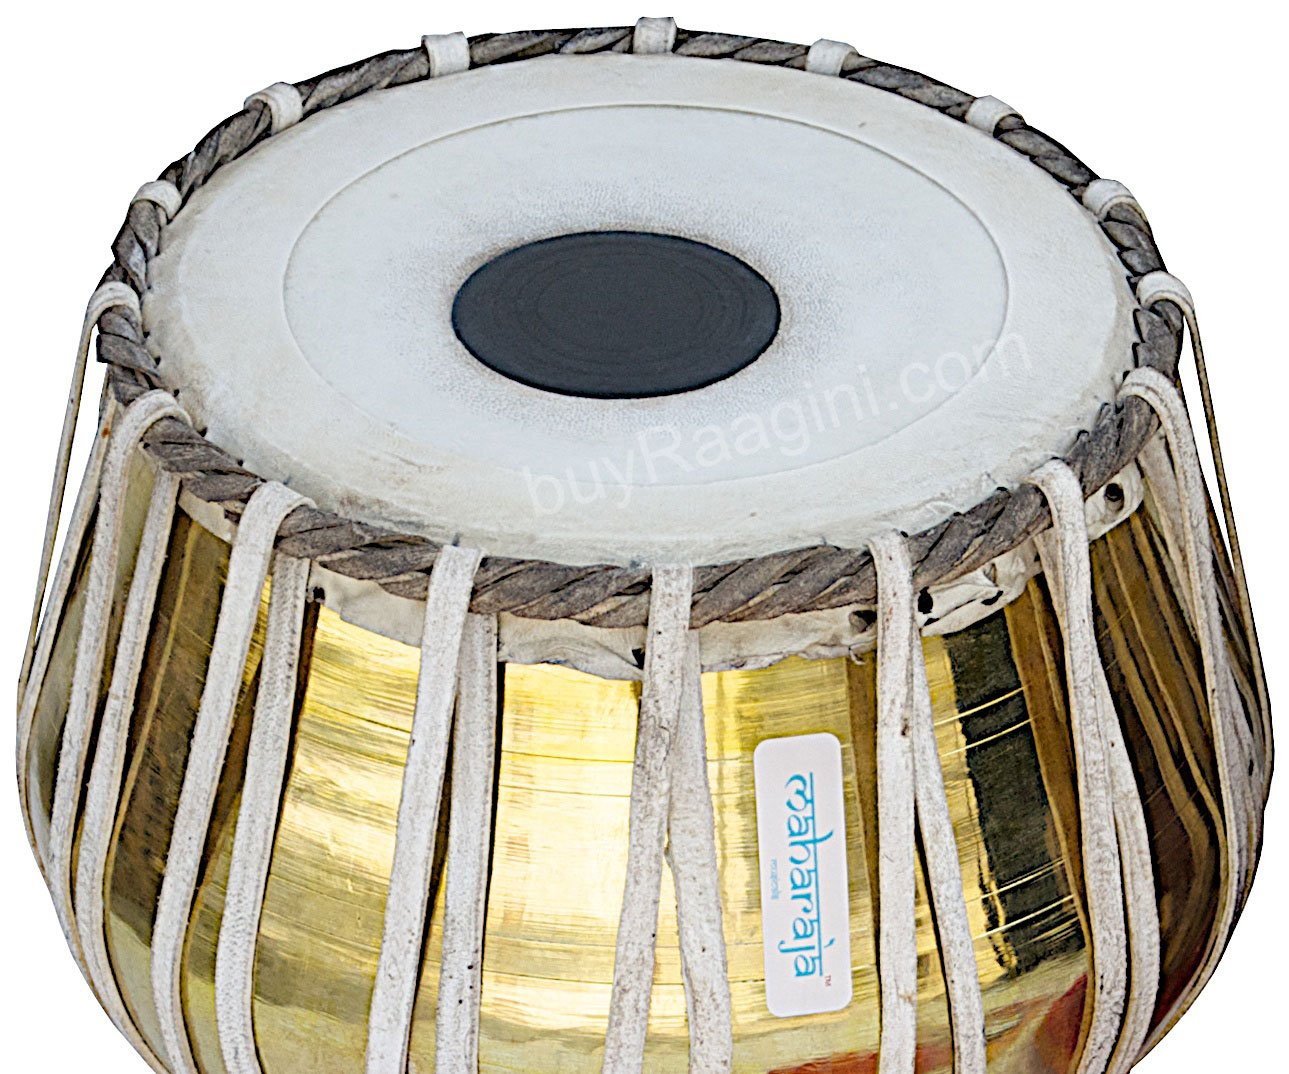 Tabla Set by Maharaja Musicals, Golden Brass Bayan 3Kg, Sheesham Dayan Tabla, Nylon Bag, Hammer, Book, Cushions, Cover, Tabla Indian Drums (PDI-CH) by Maharaja Musicals (Image #4)